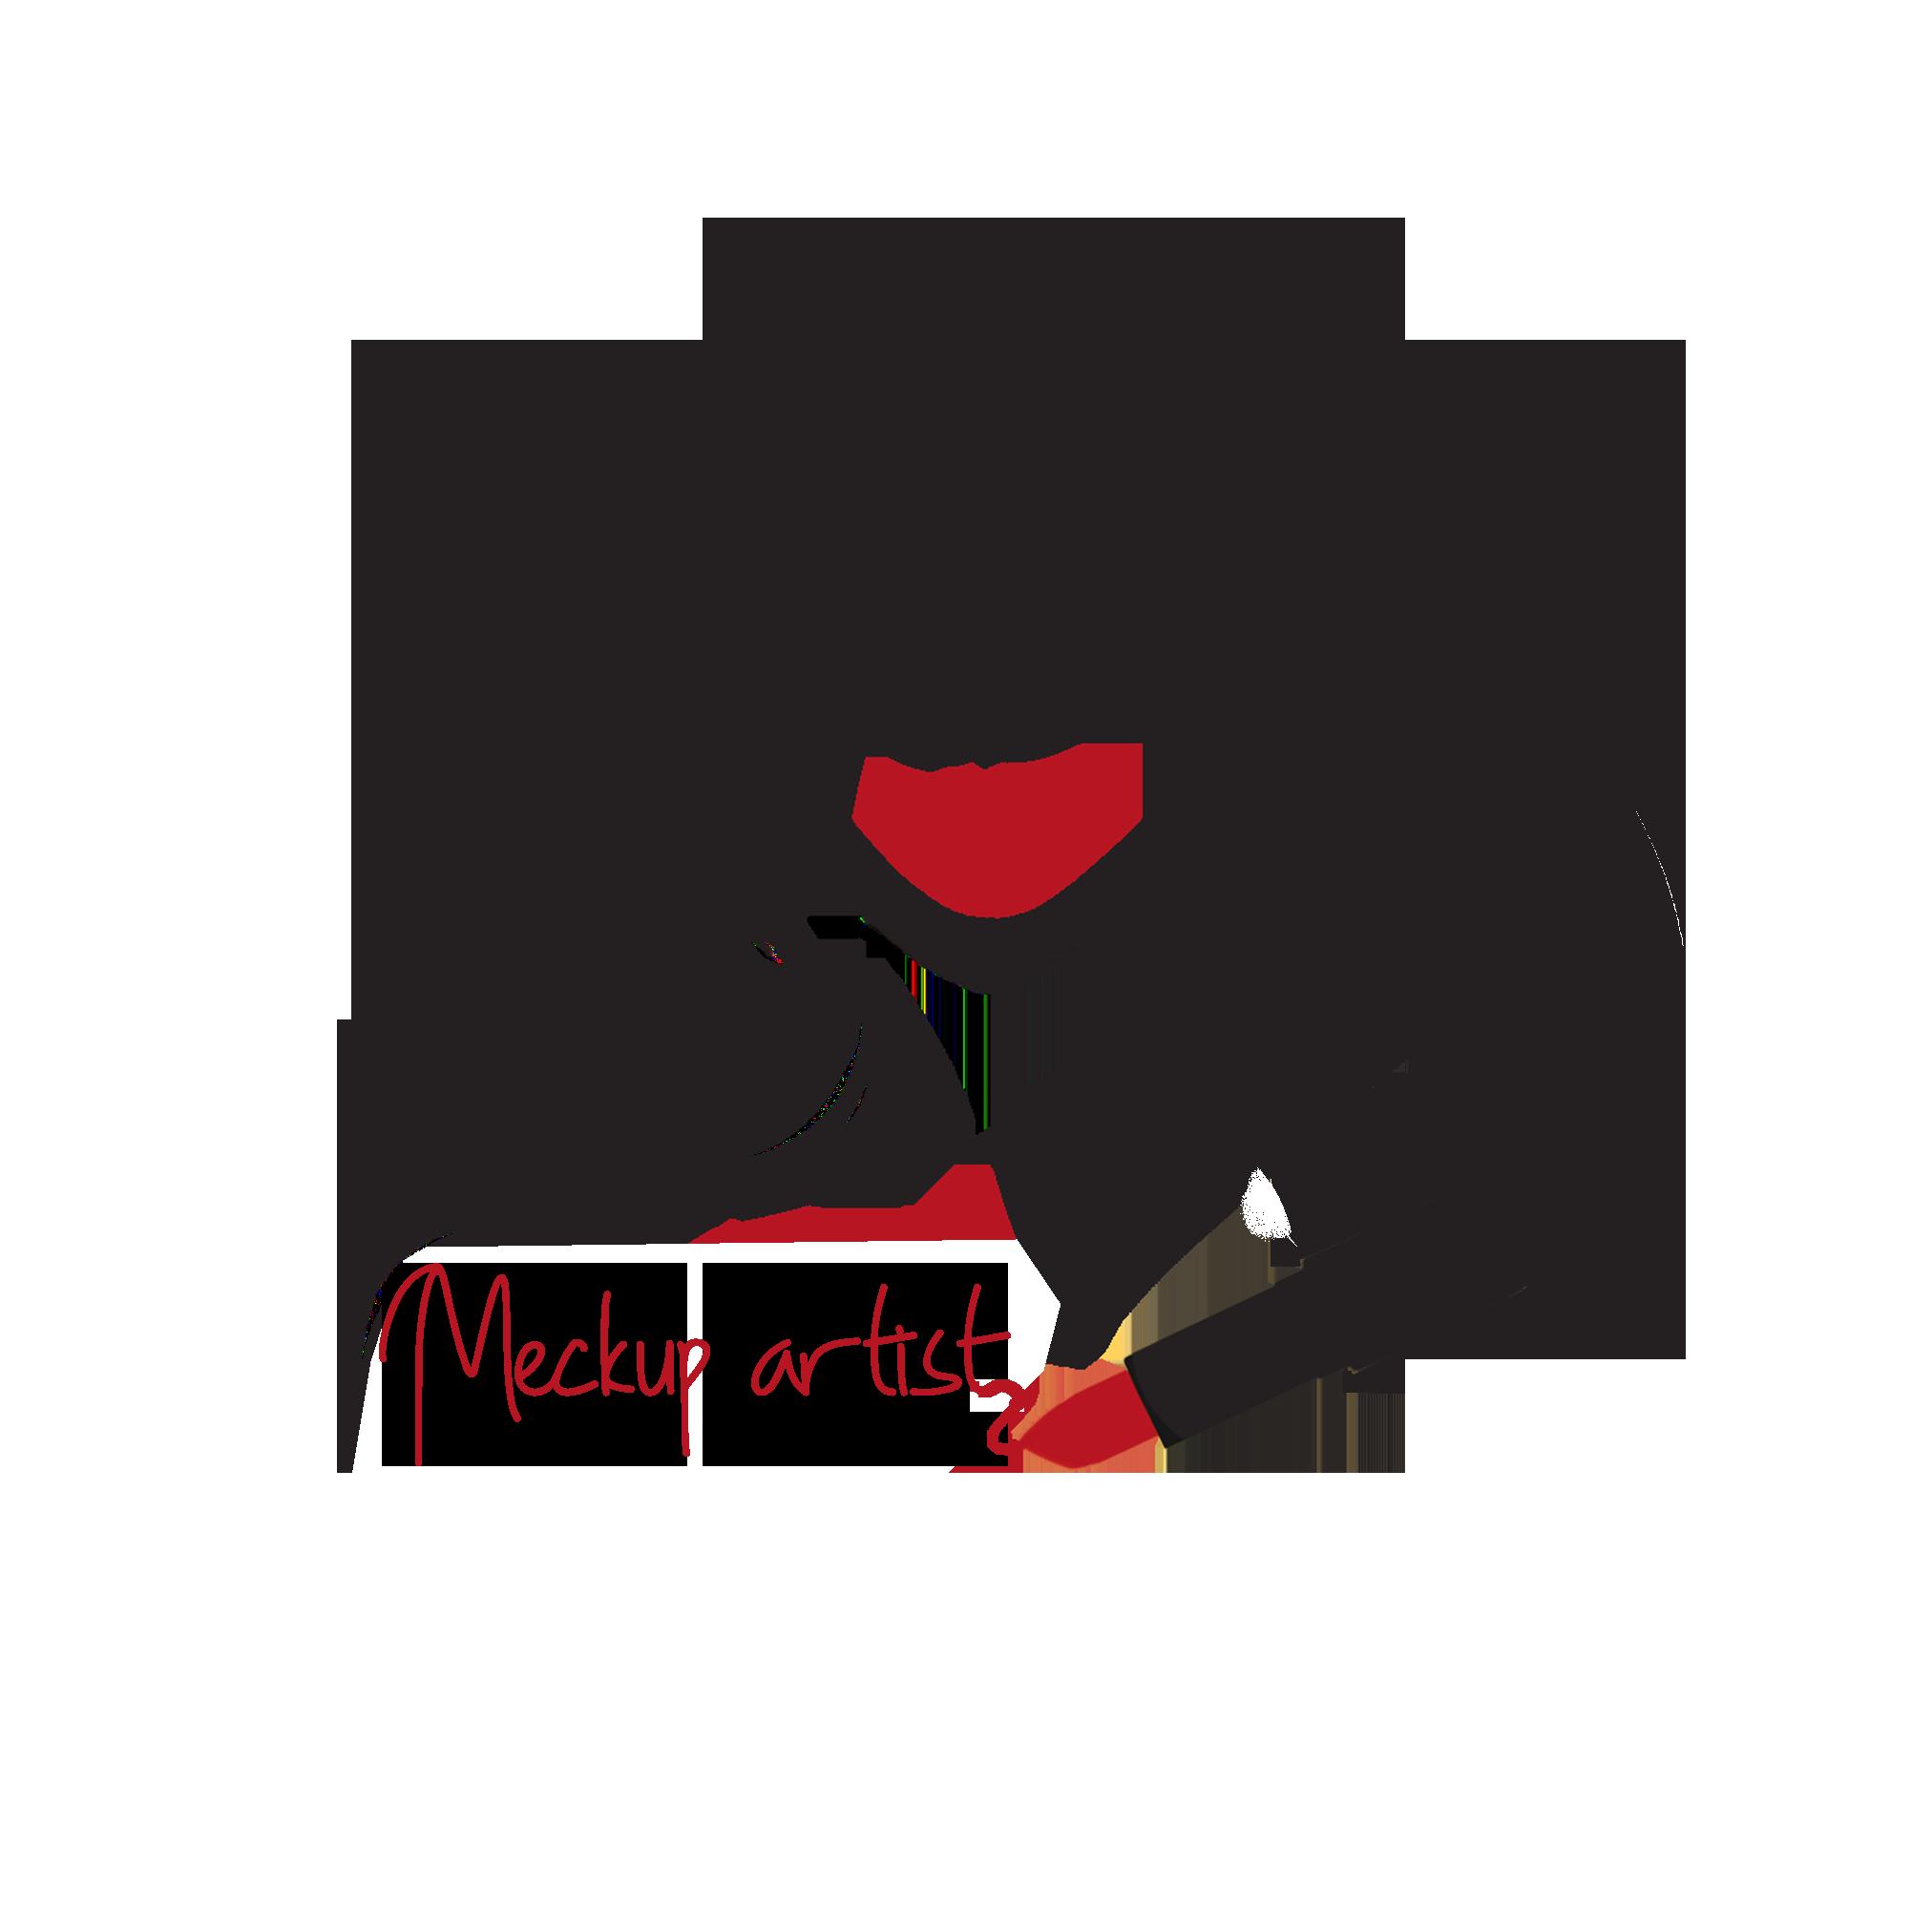 Makeup artist logo Makeup artist logo, Artist logo